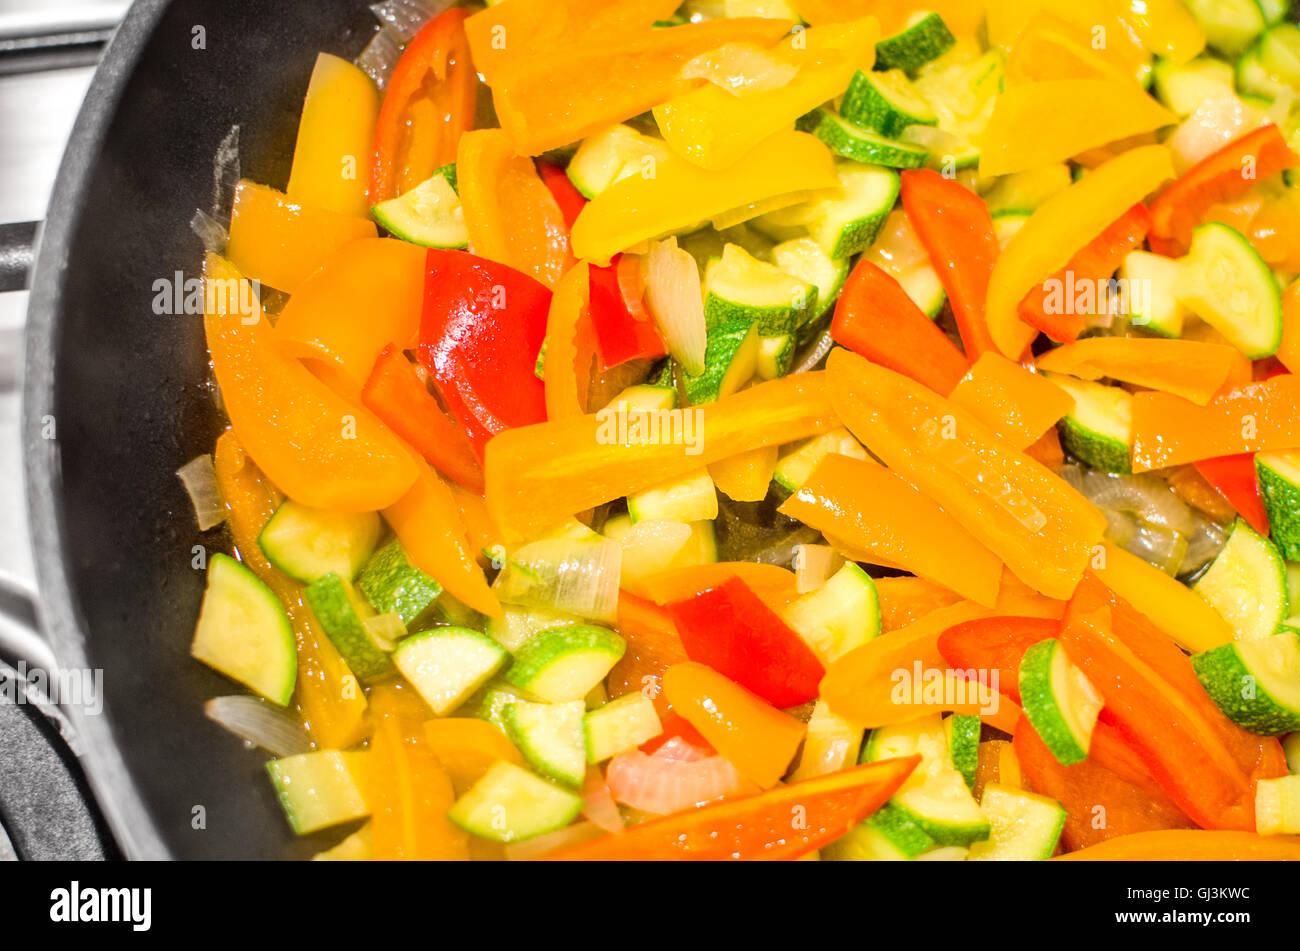 bunte geschnittenem Gemüse Closeup vegane Rezepte Stockbild